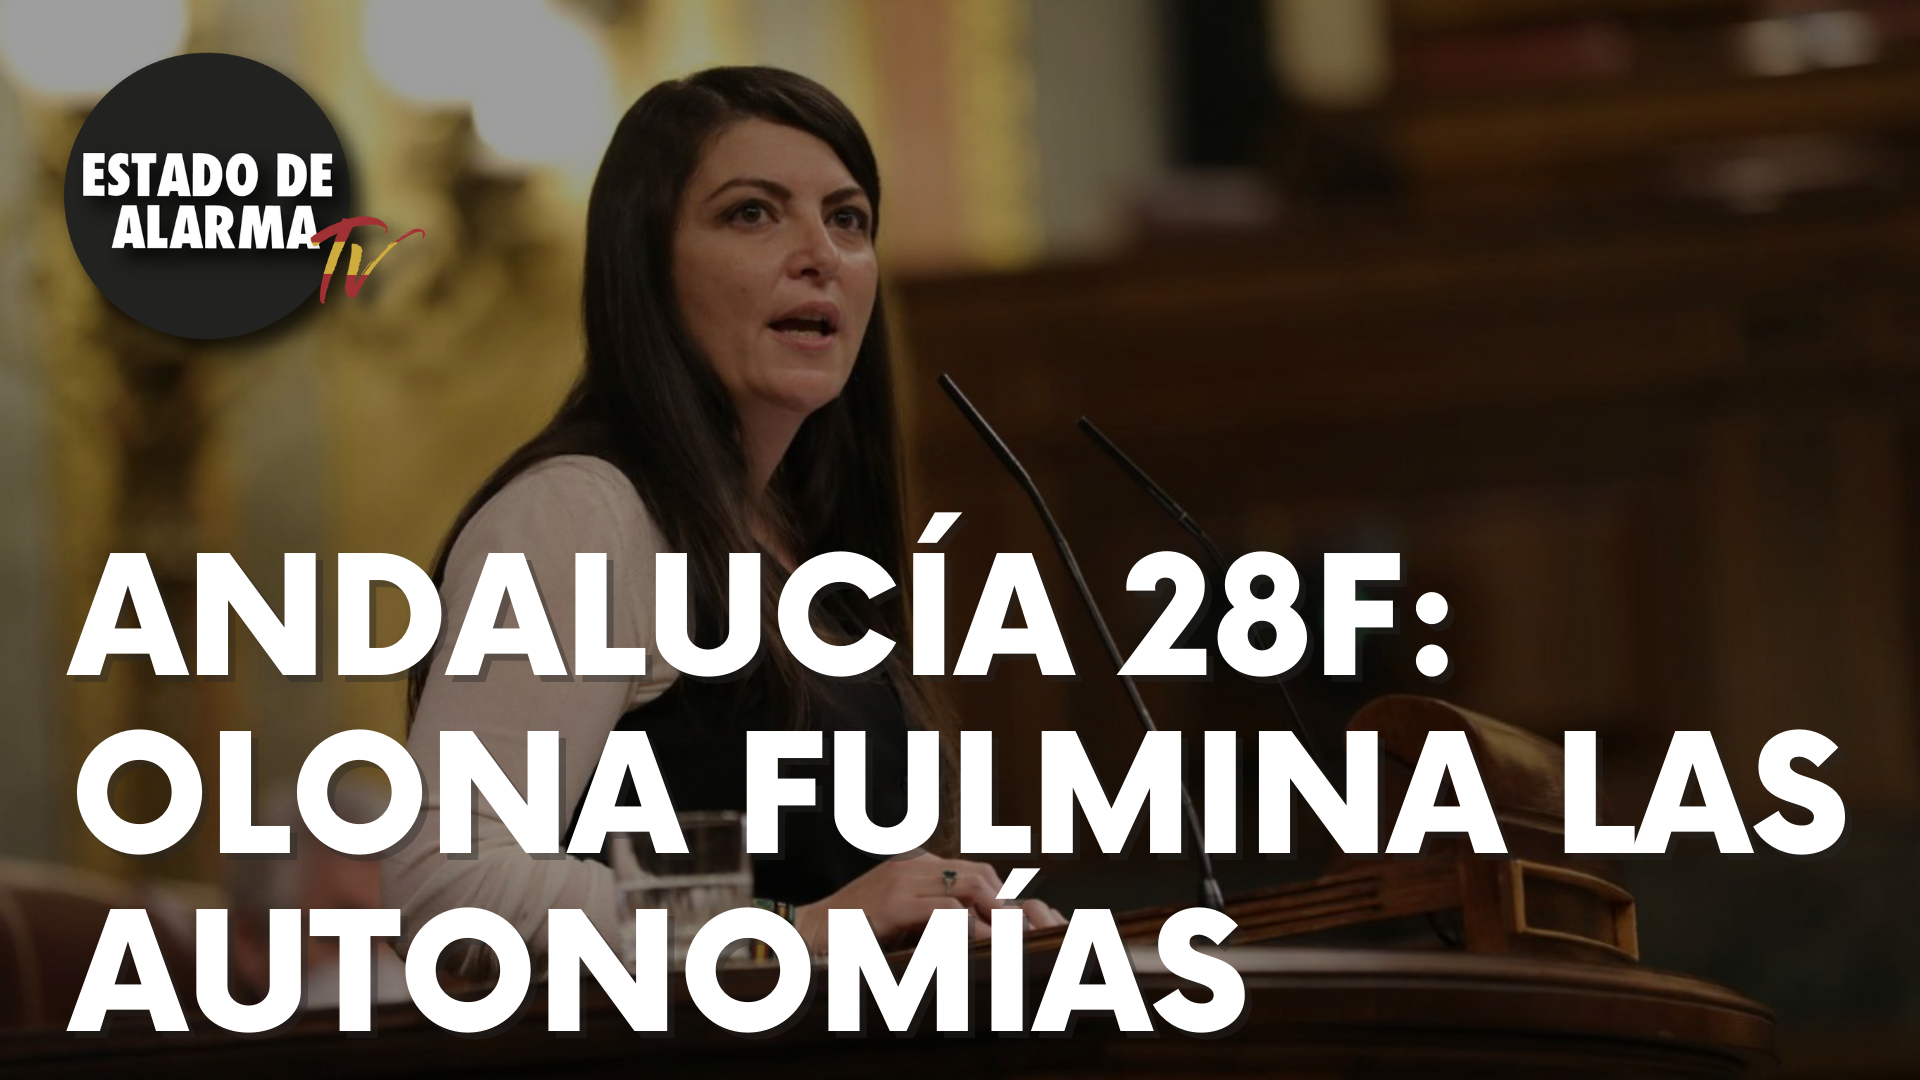 Andalucía 28F: Macarena Olona fulmina las autonomías